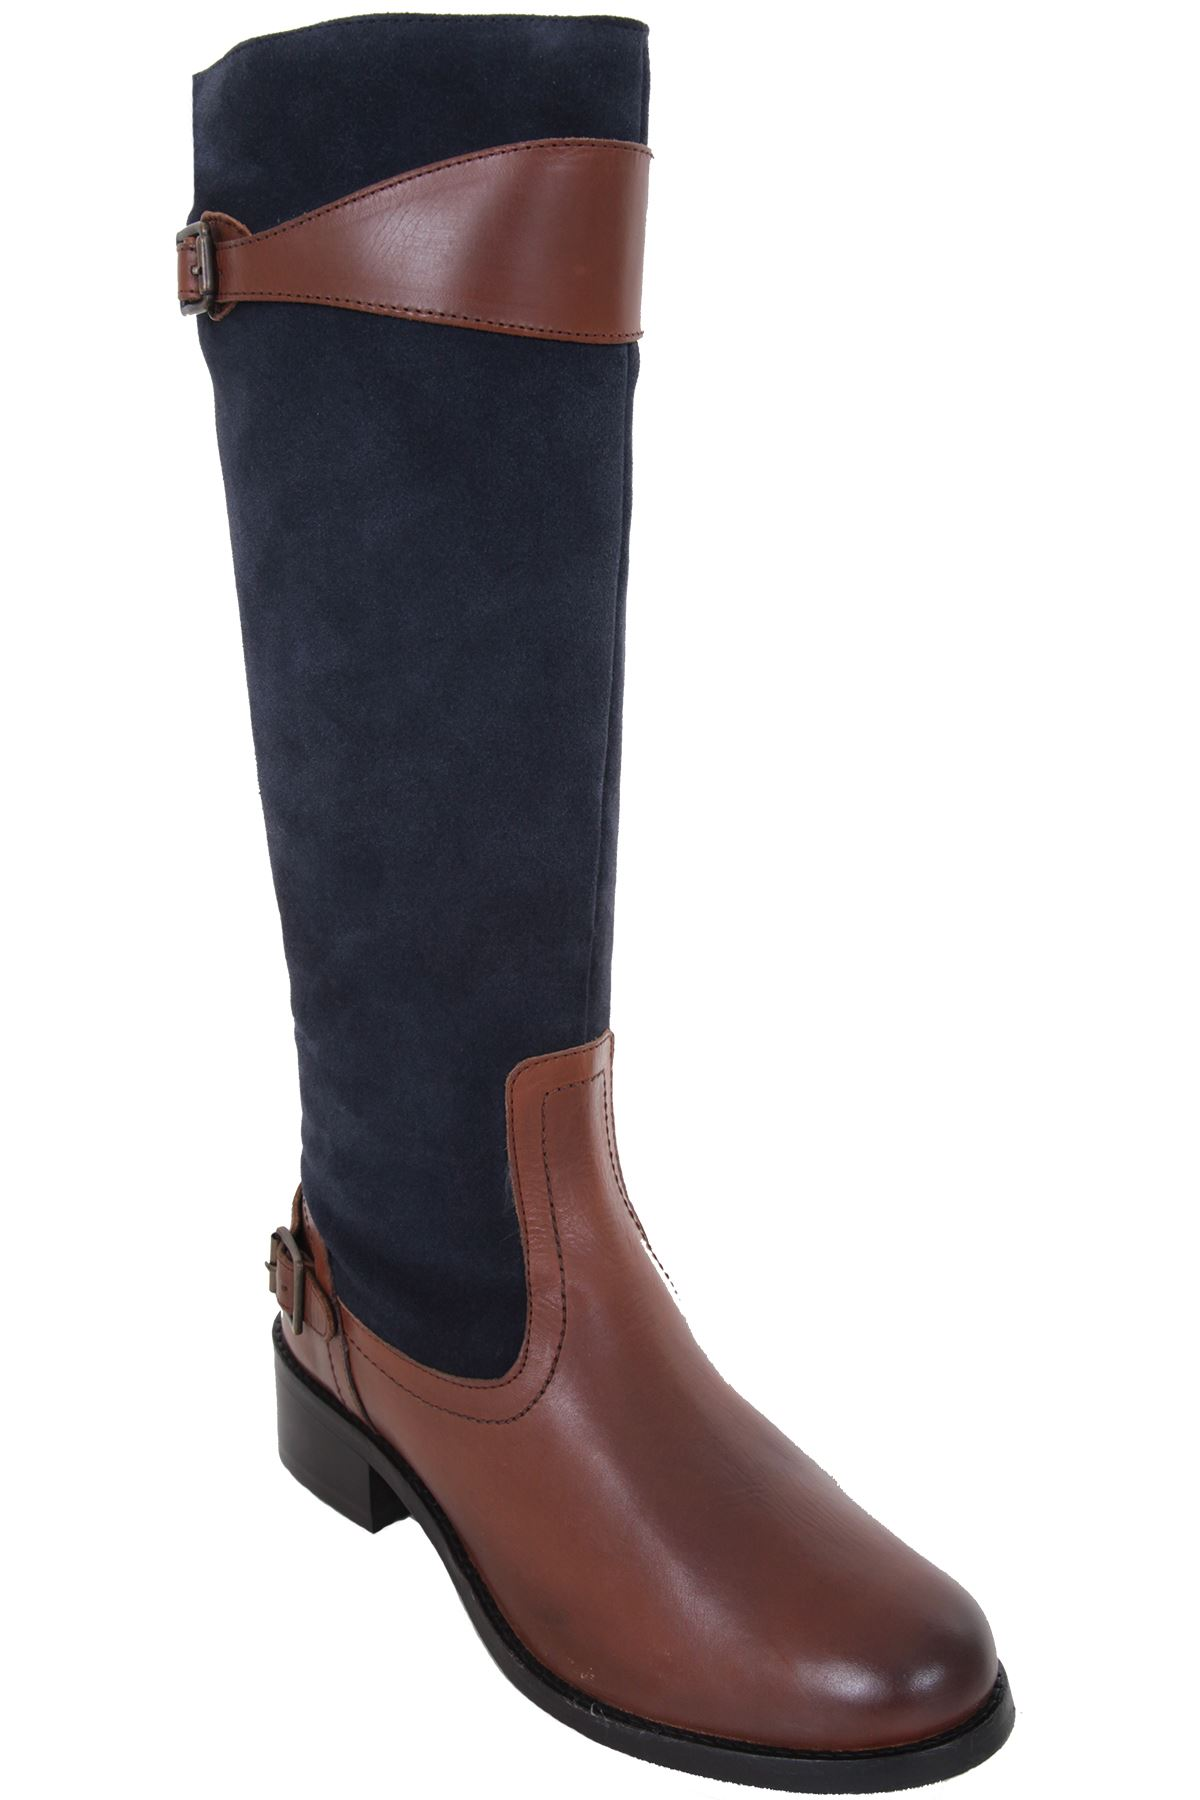 GLH471 Suede Contrast Real Genuine Leder Stiefel Calf High Niedrig Heel Stiefel Leder 689dd2